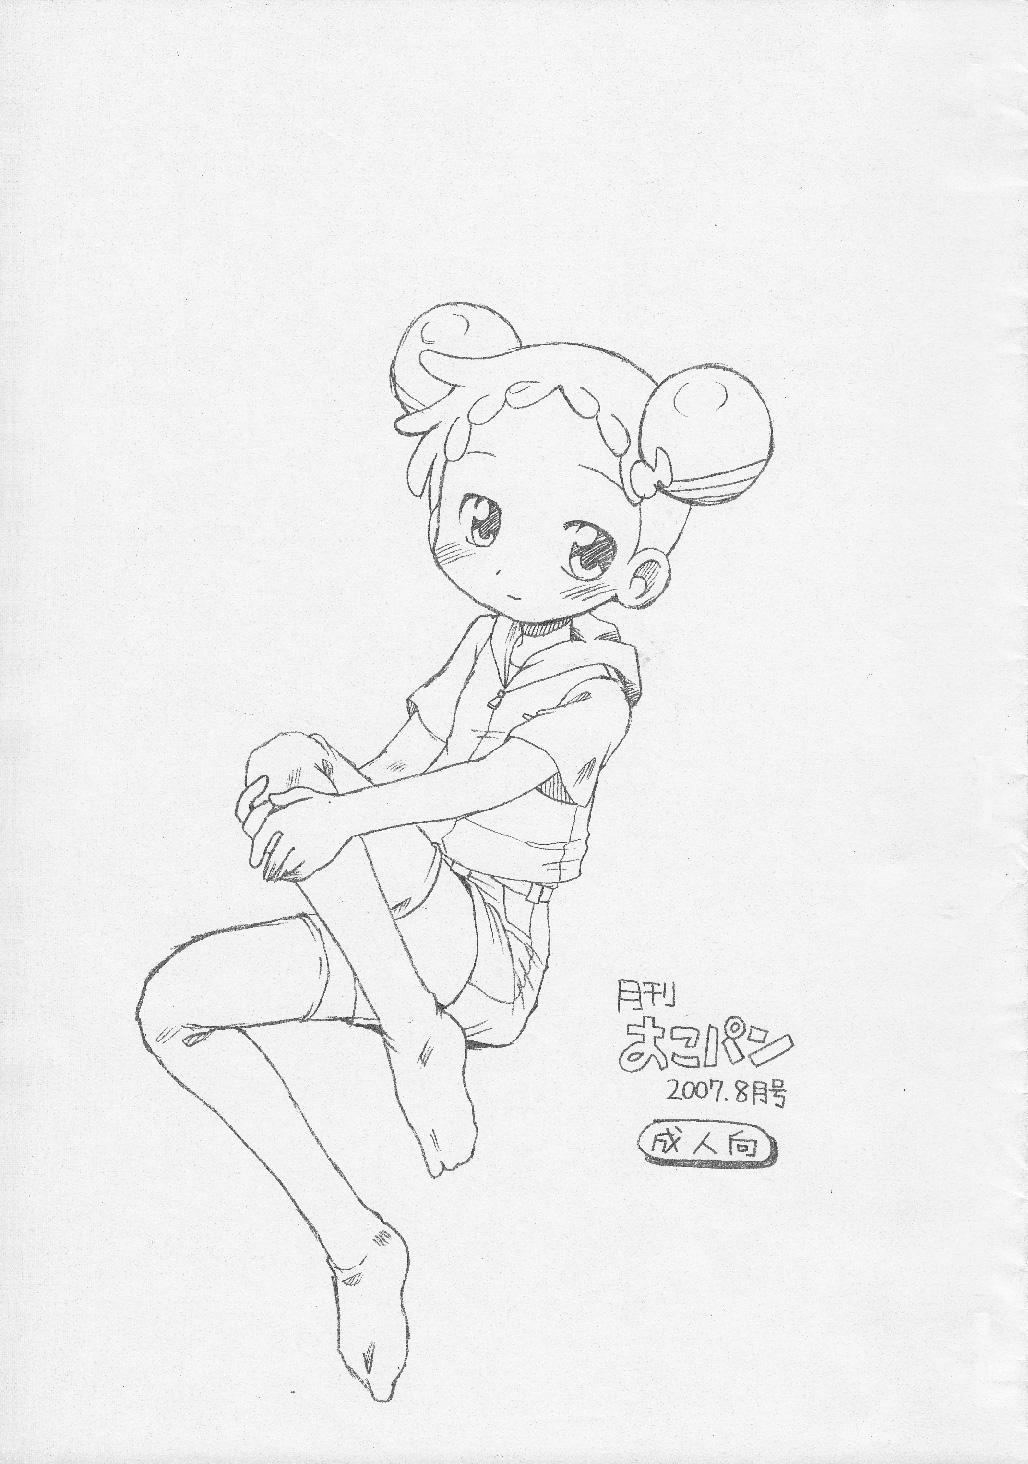 [ Okosama Pankeki (Arurukaana 7A)]Gekkan oko pan 2007-nen 8 tsuki-gō (Ojamajo Doremi) 0